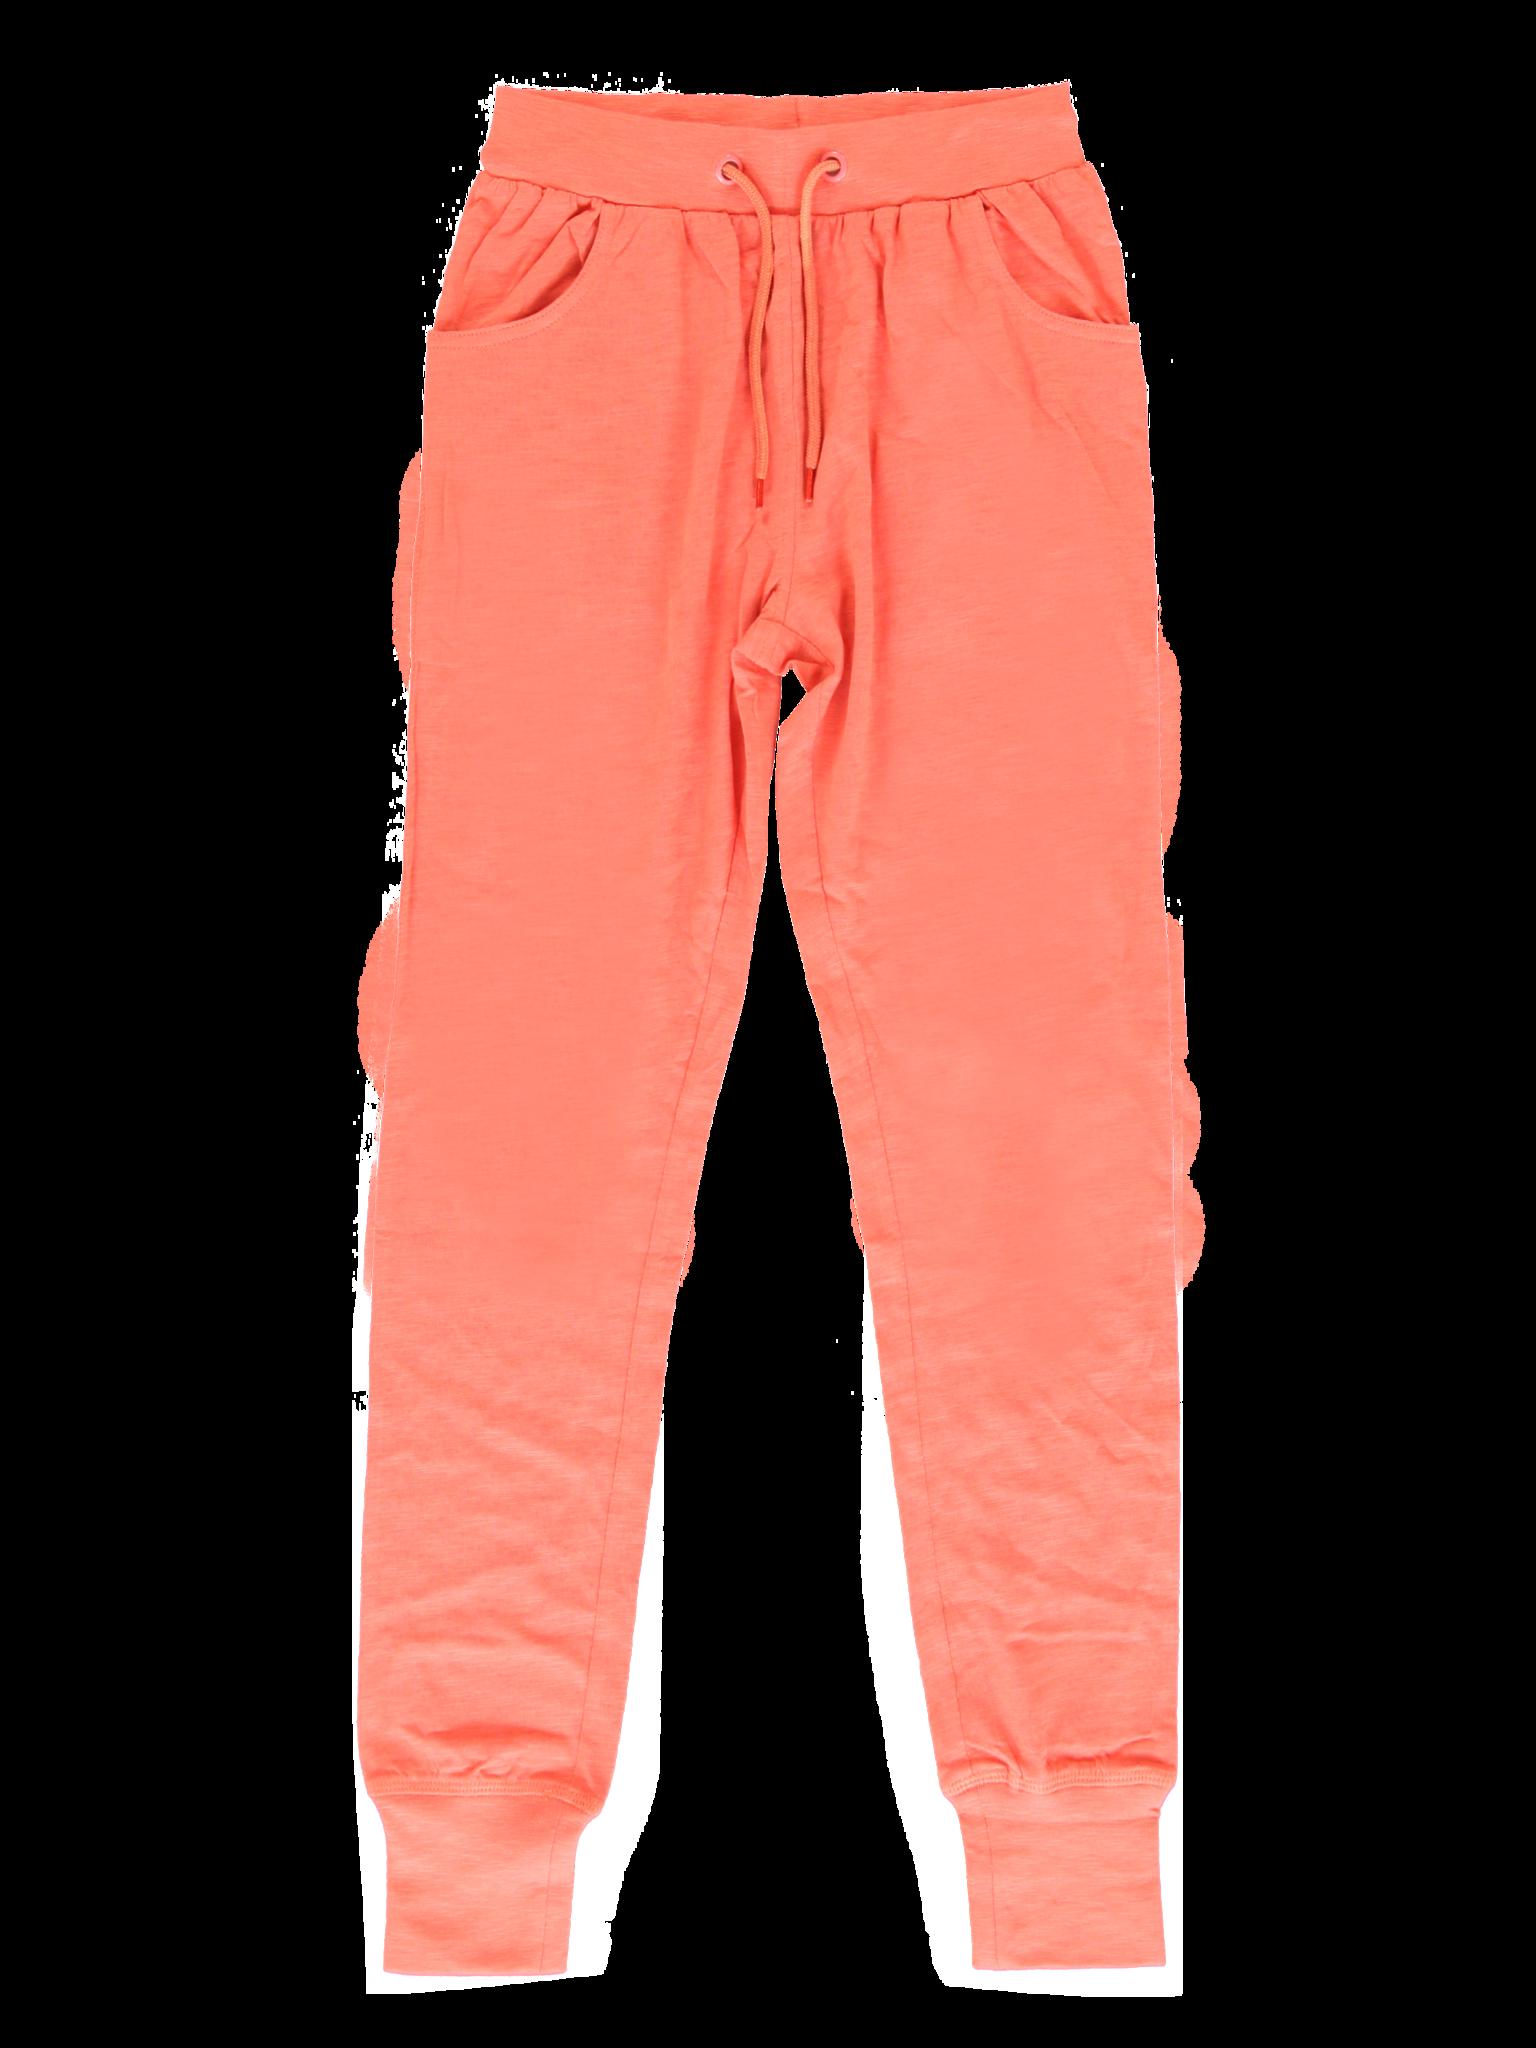 All Brands | Summerproducts Teen Girls | Jogging Pant | 24 pcs/box